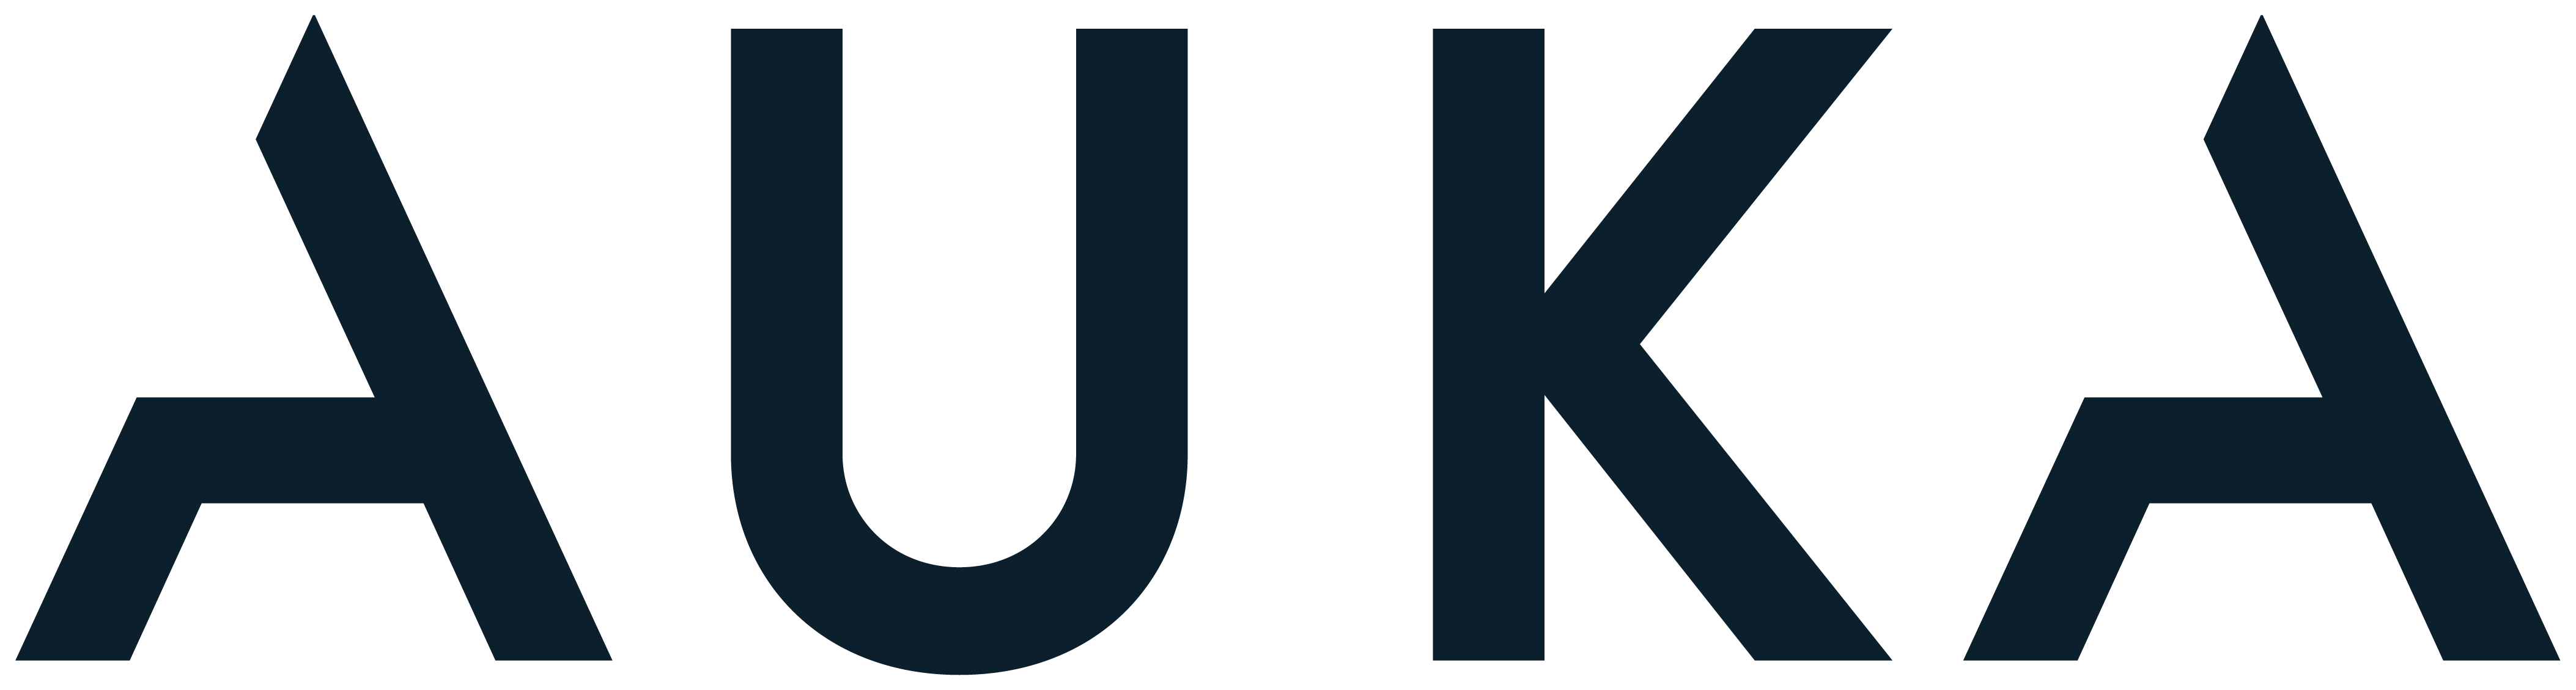 Auka logo blue